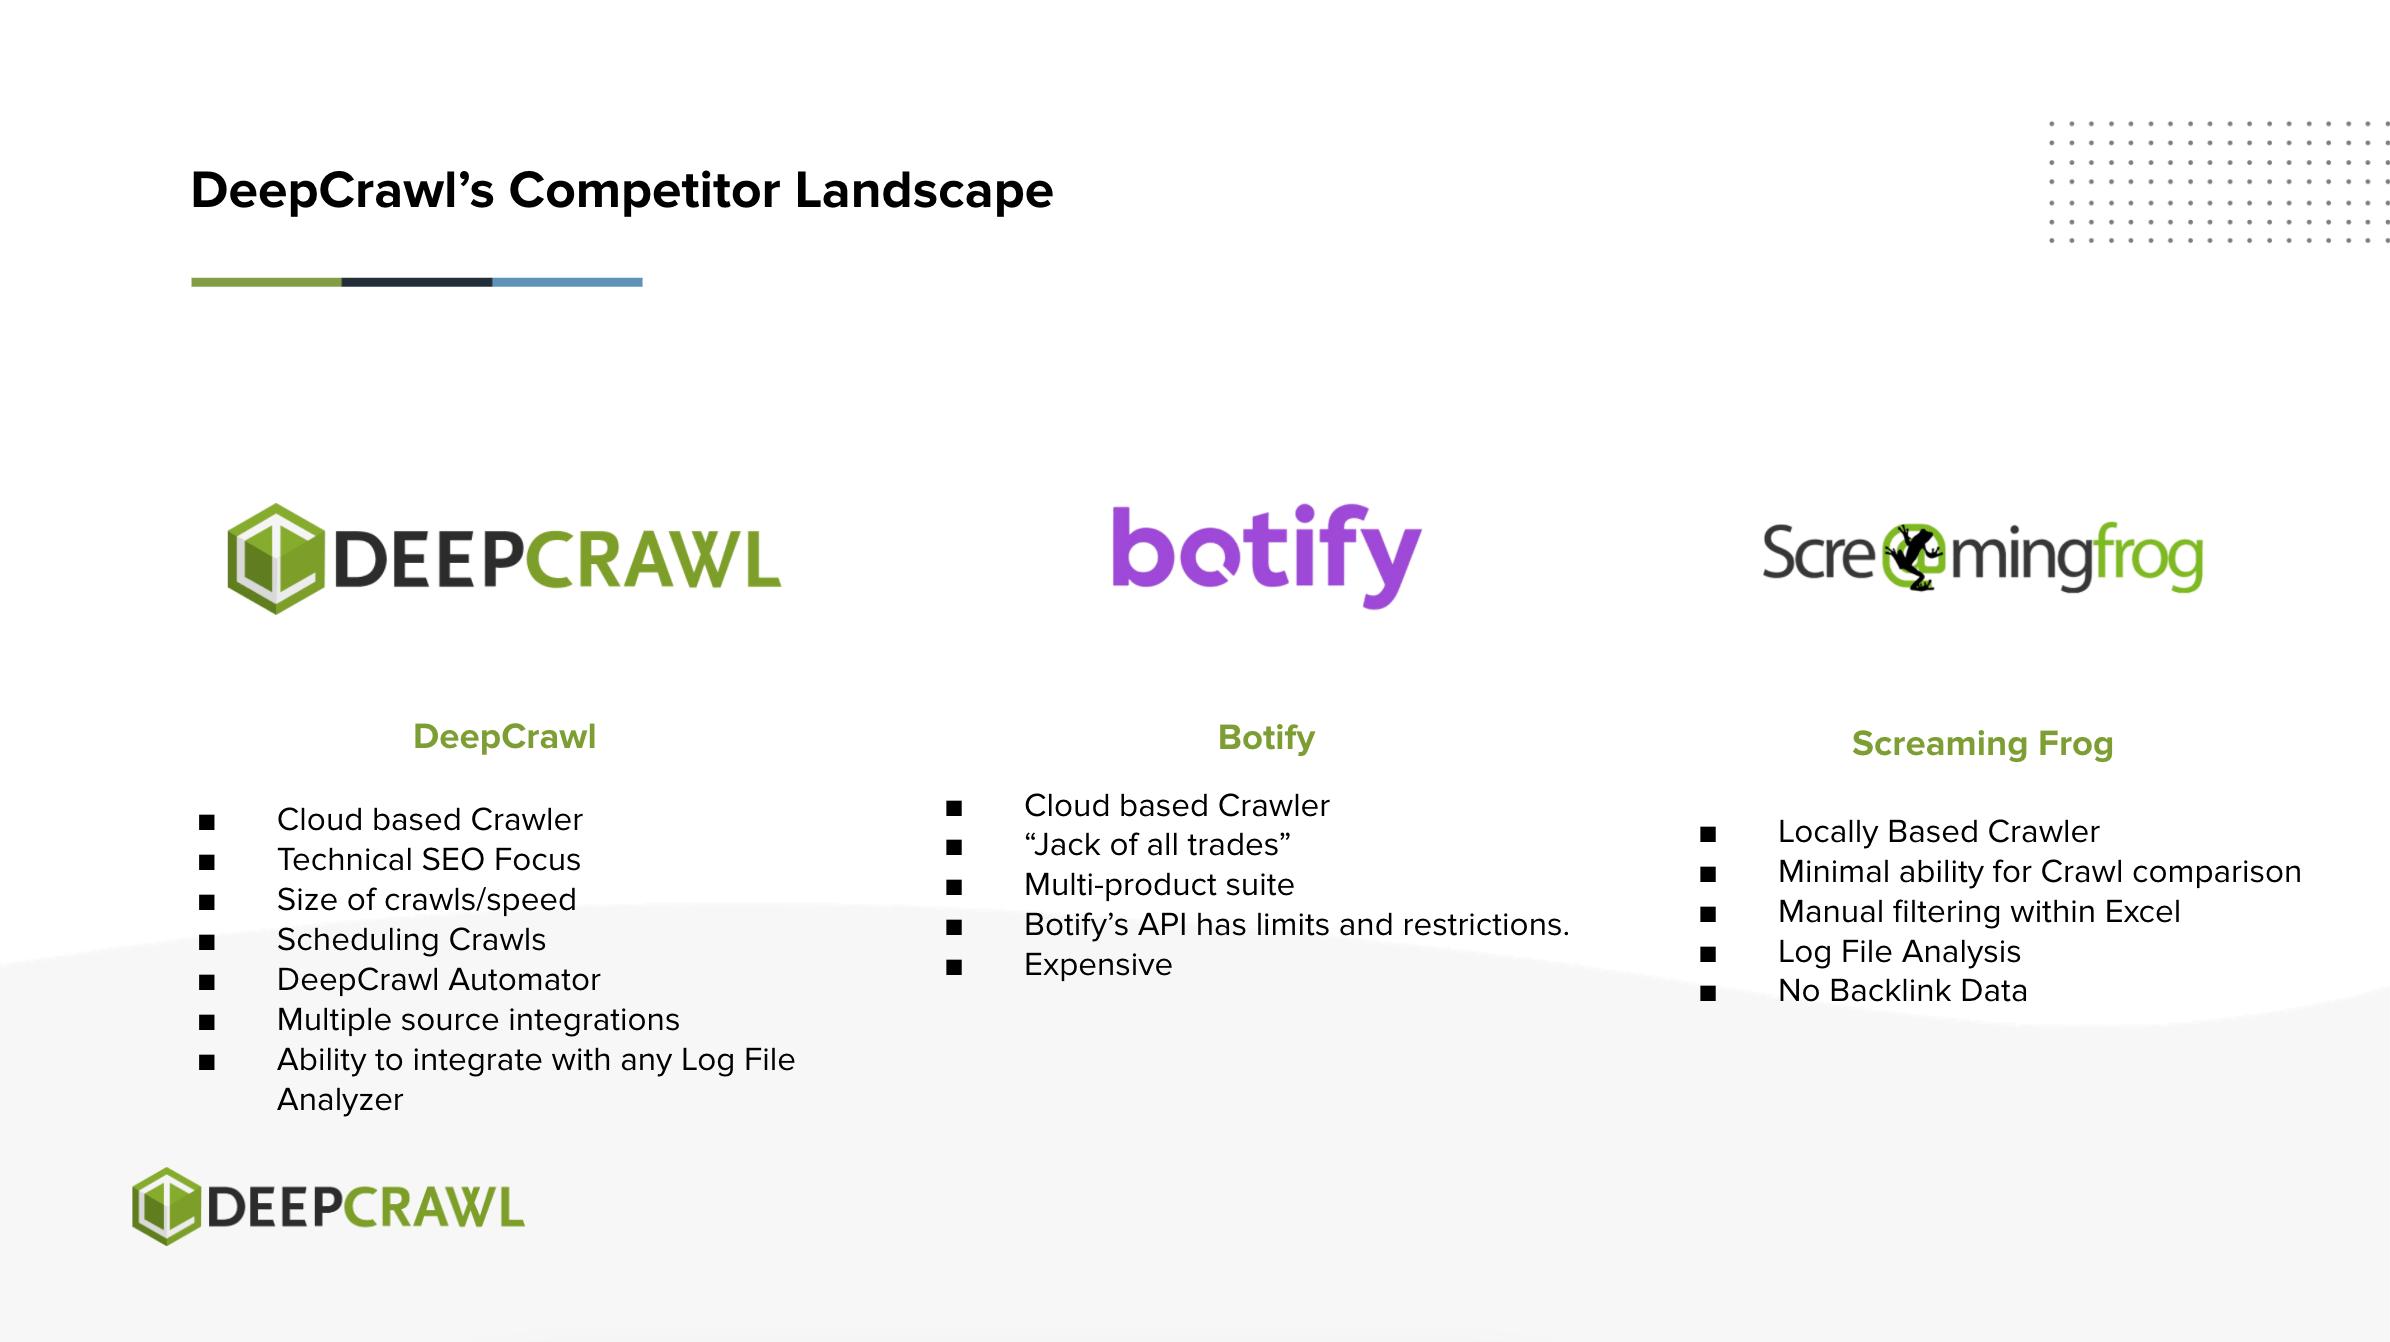 DeepCrawl Competitors and Comparison